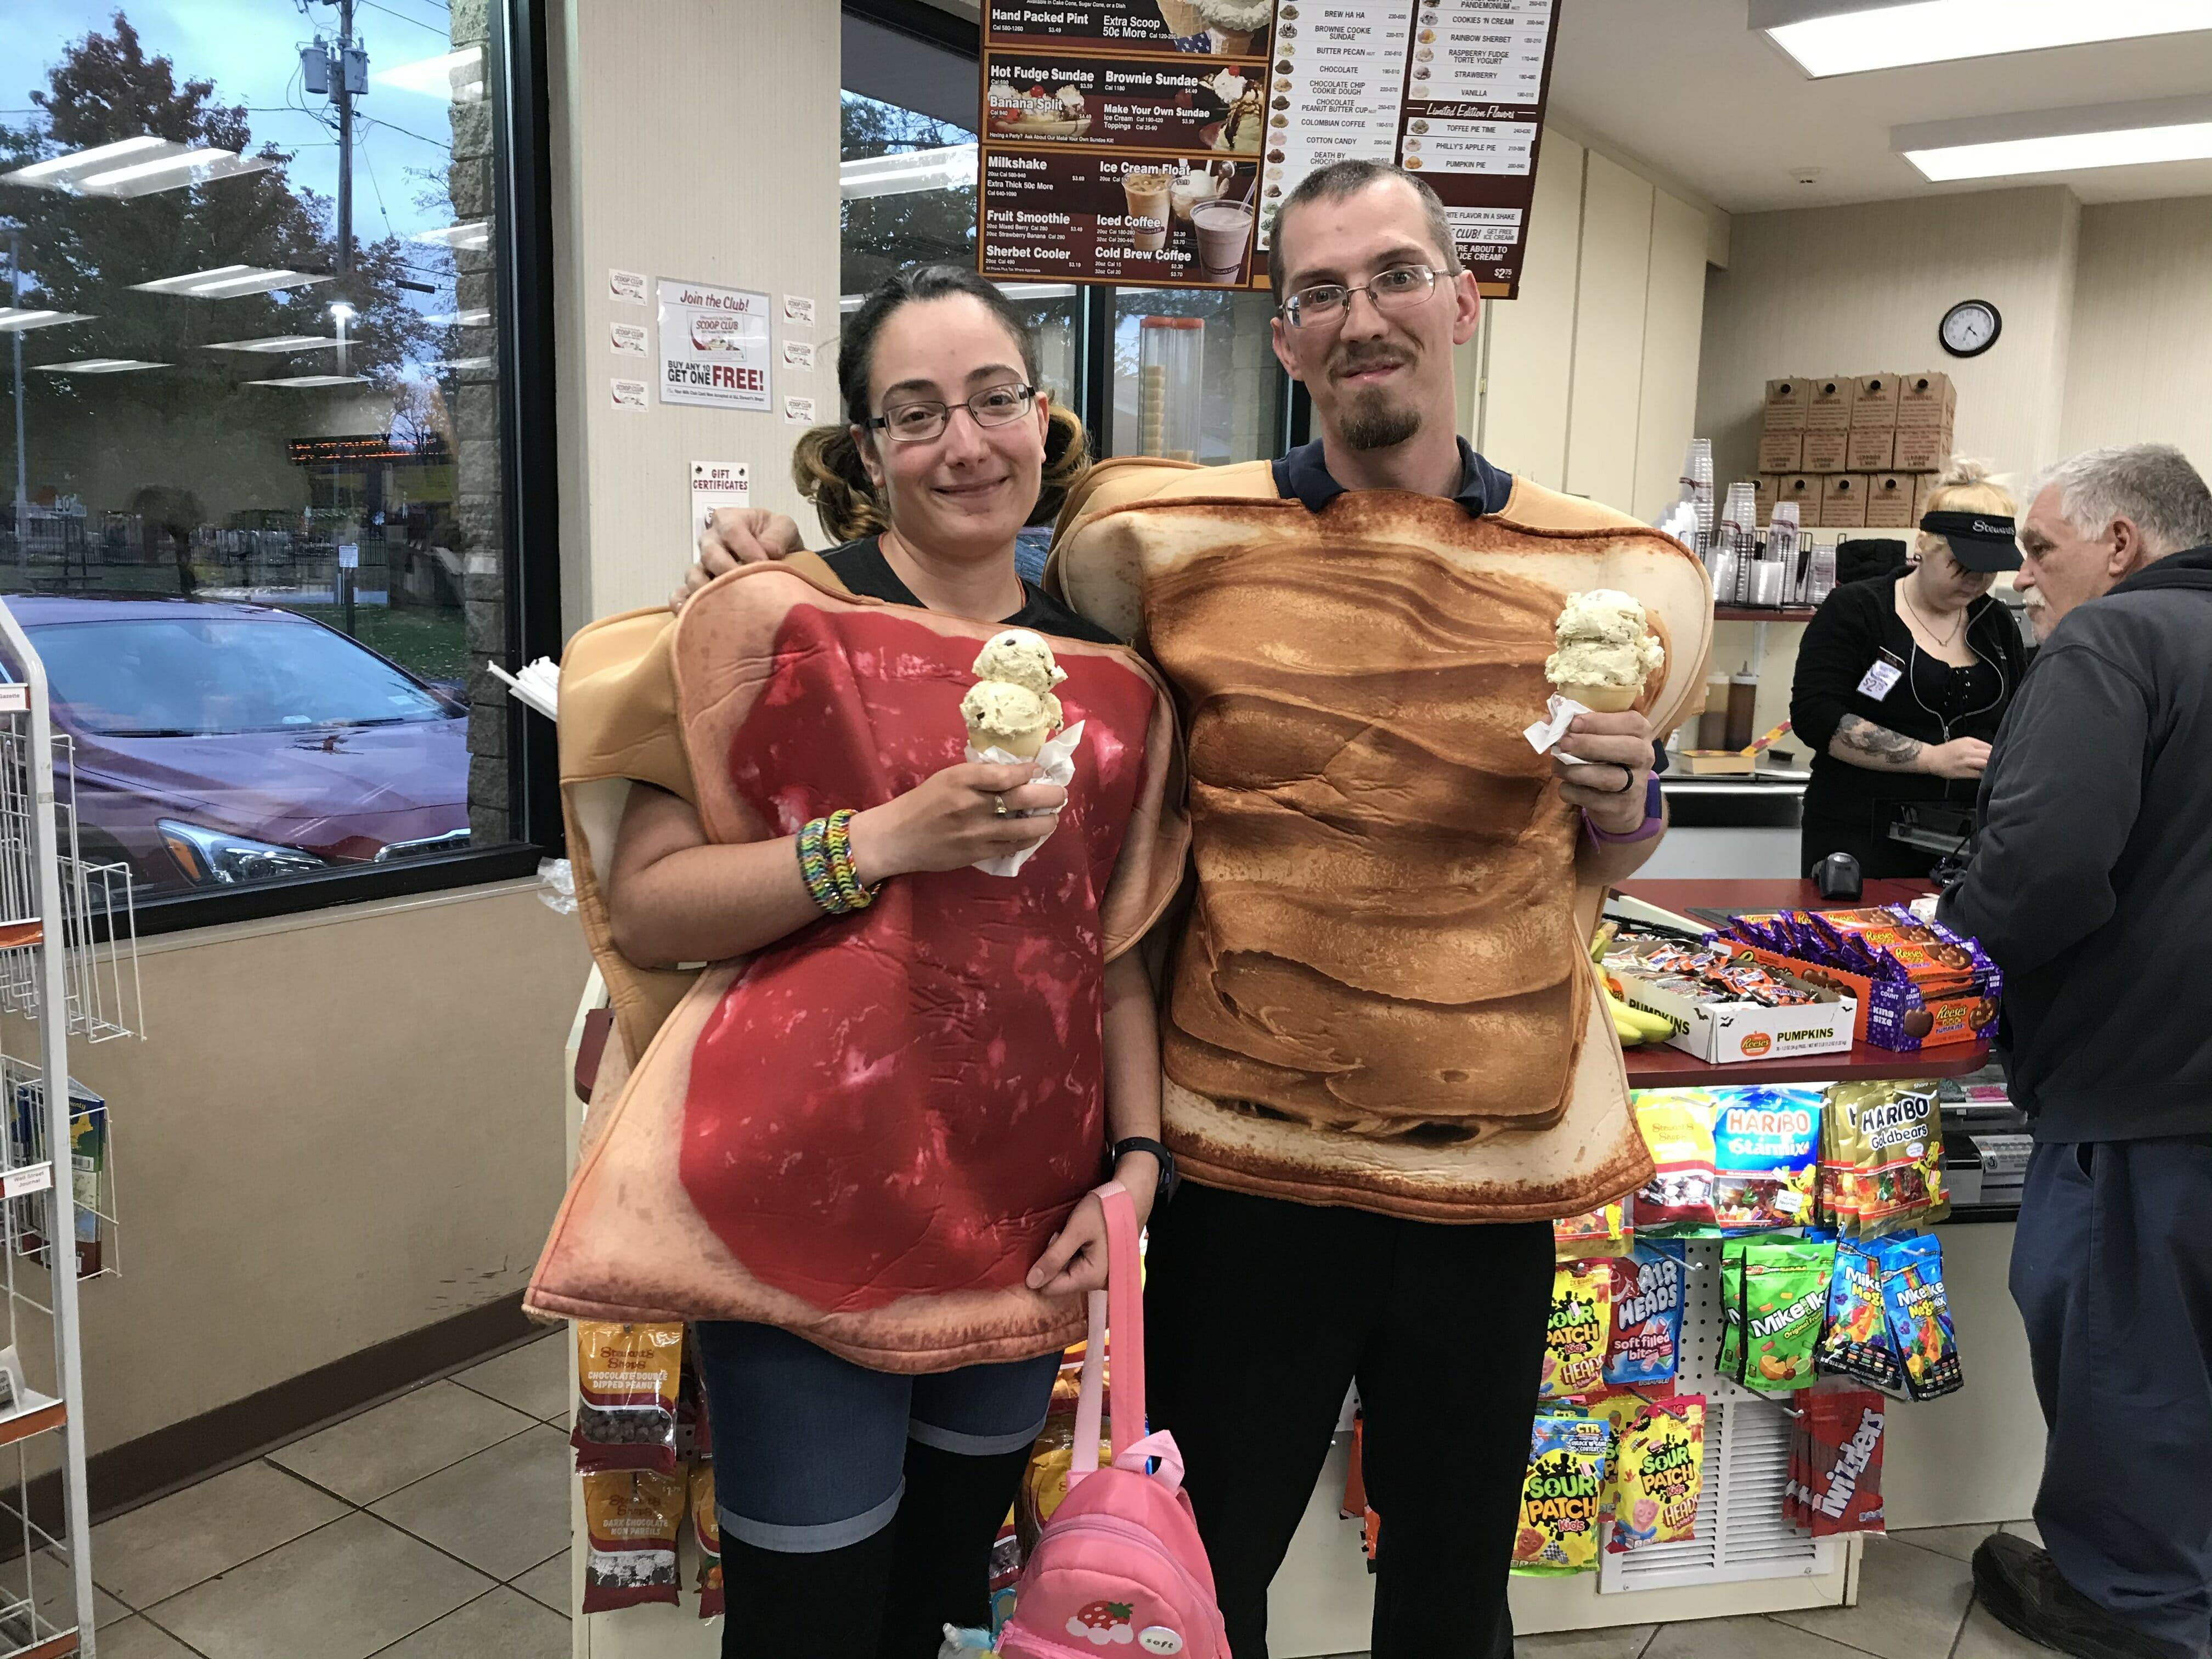 PB & J Sandwiches